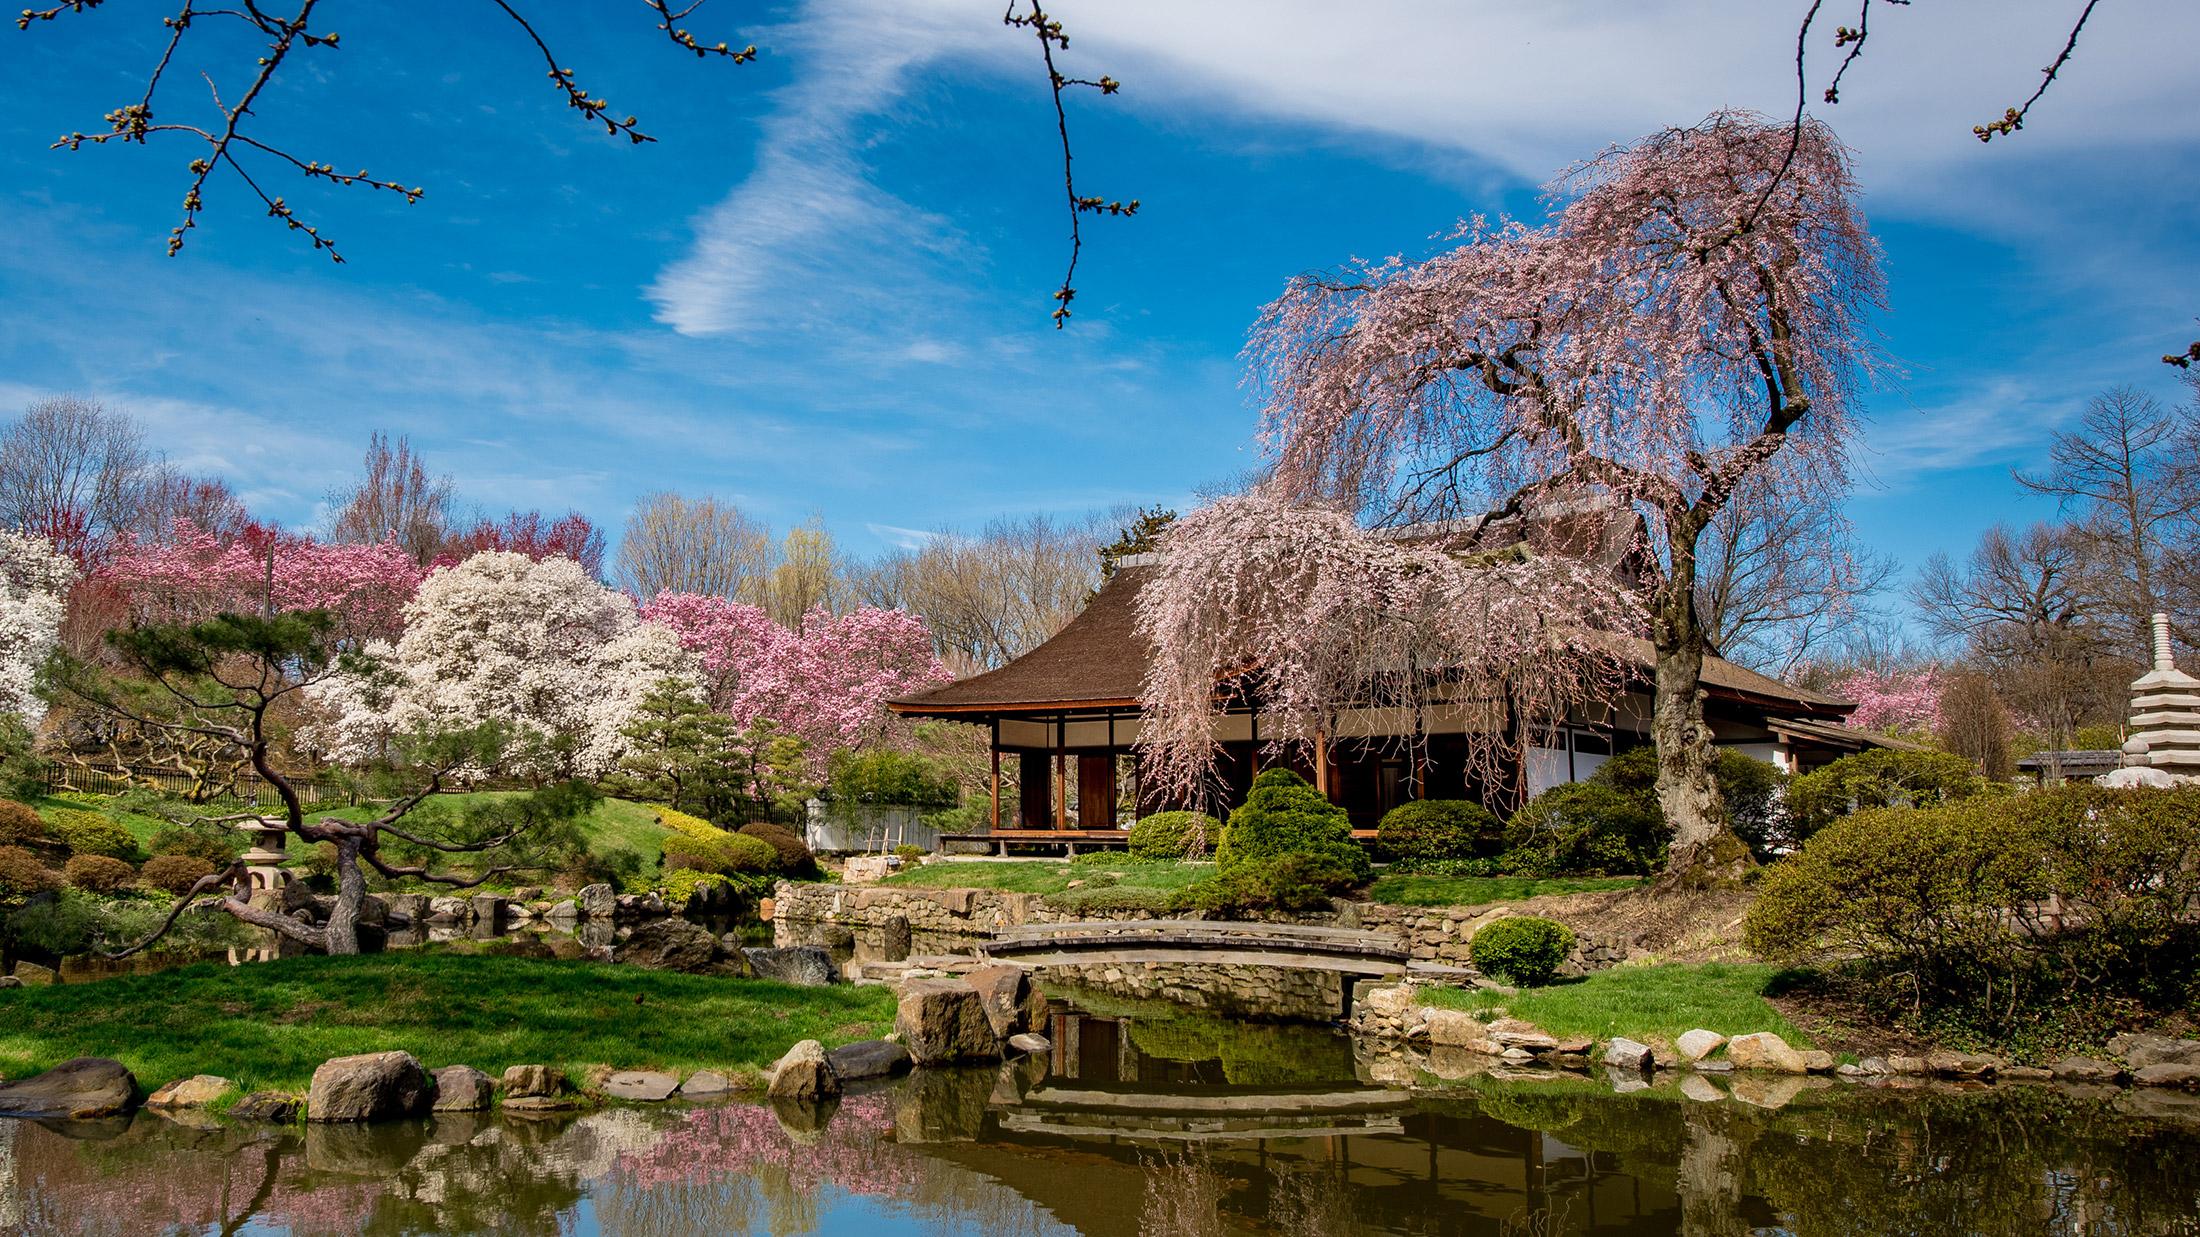 Philadelphia Cherry Blossom Festival 2020.The Subaru Cherry Blossom Festival Of Greater Philadelphia